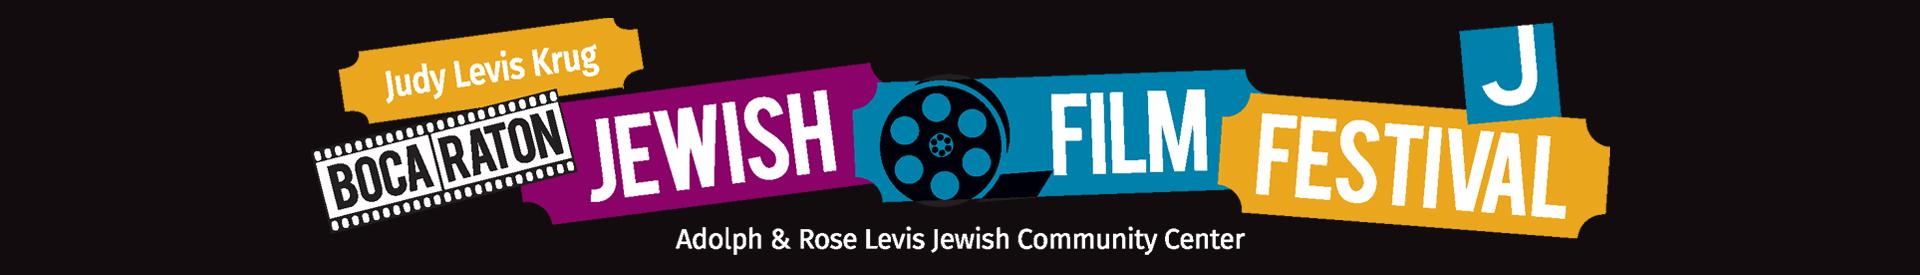 Judy Levis Krug Boca Raton Virtual Jewish Film Festival